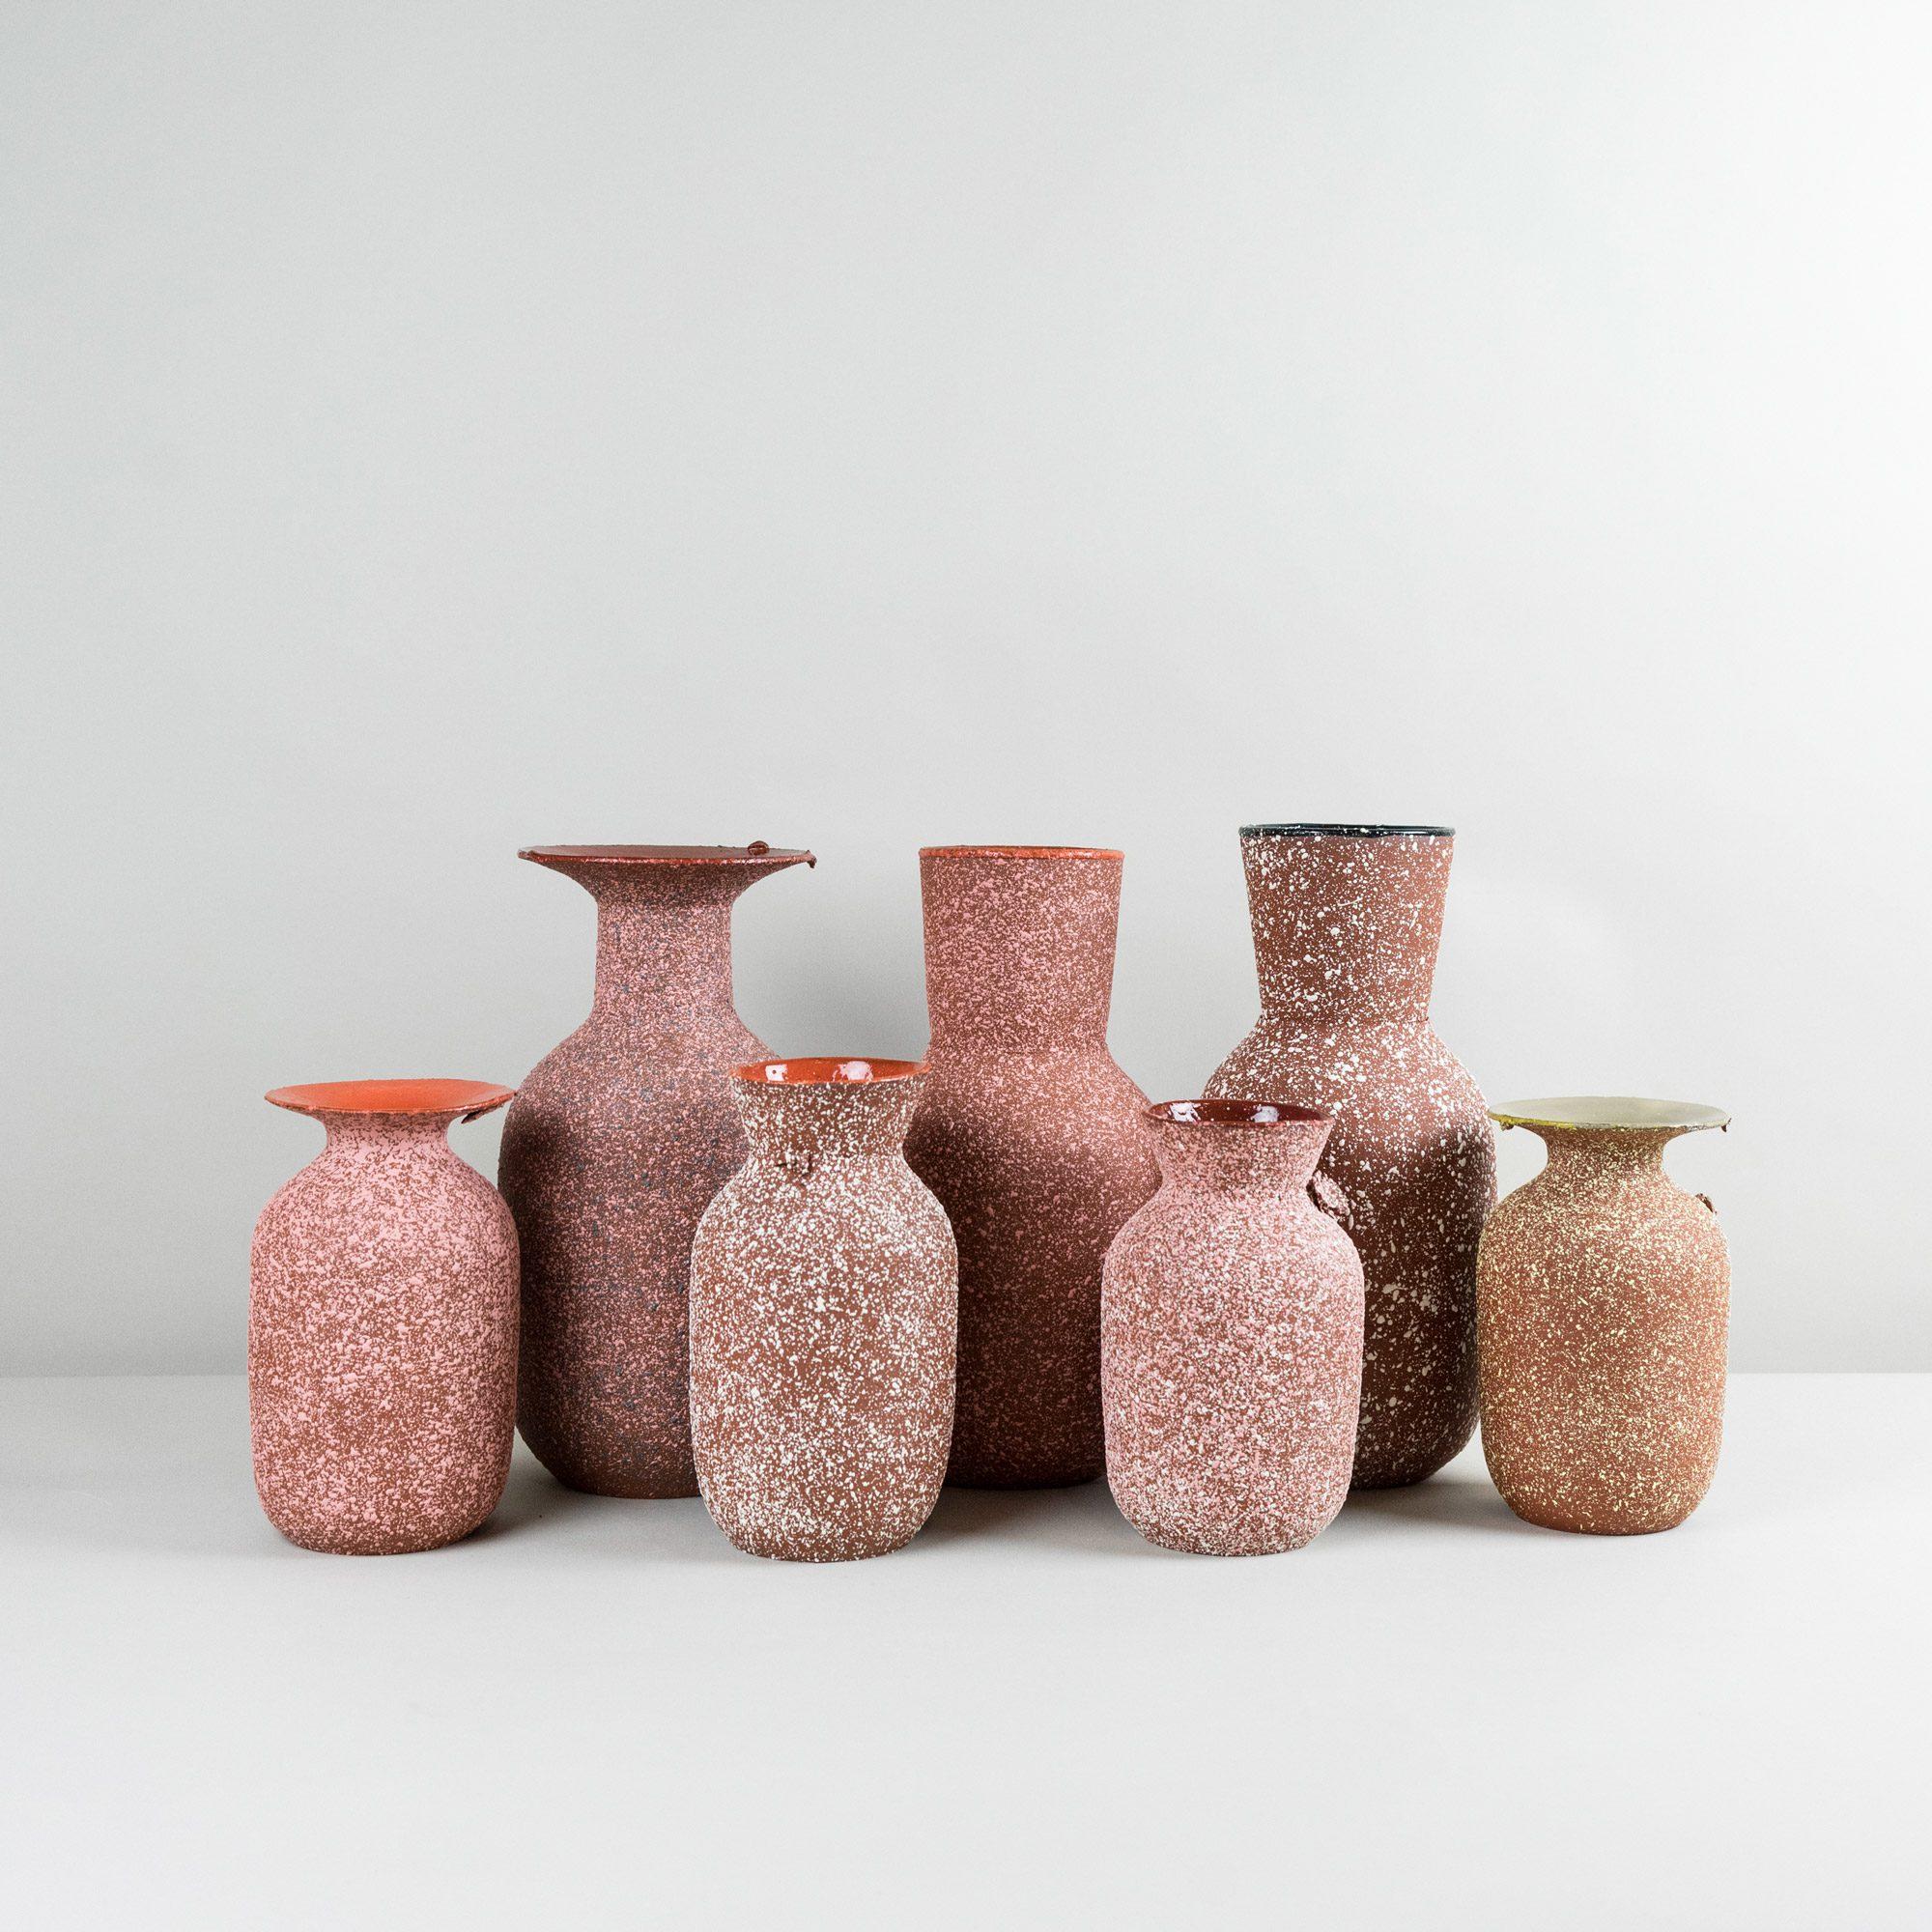 Tall and medium ceramic vases handmade by Czech designer Roman Sedina